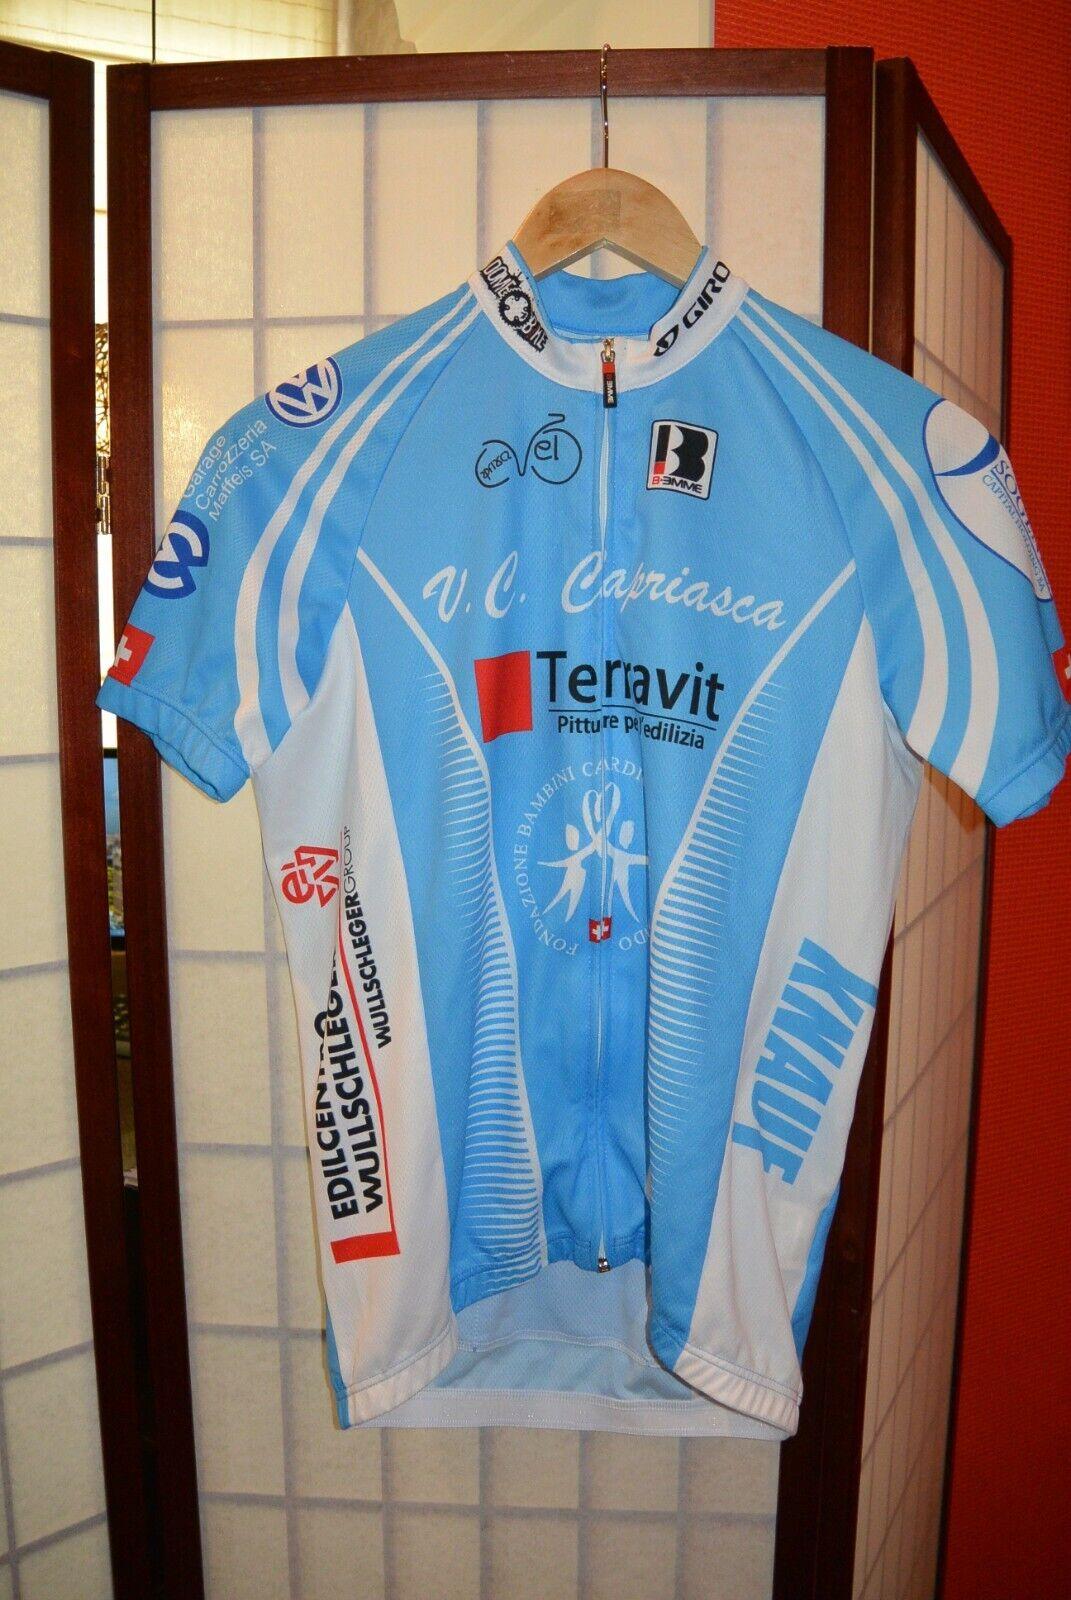 Biemme Teravit V.C Capriasca retro vintage  cycling jersey   ( 102)